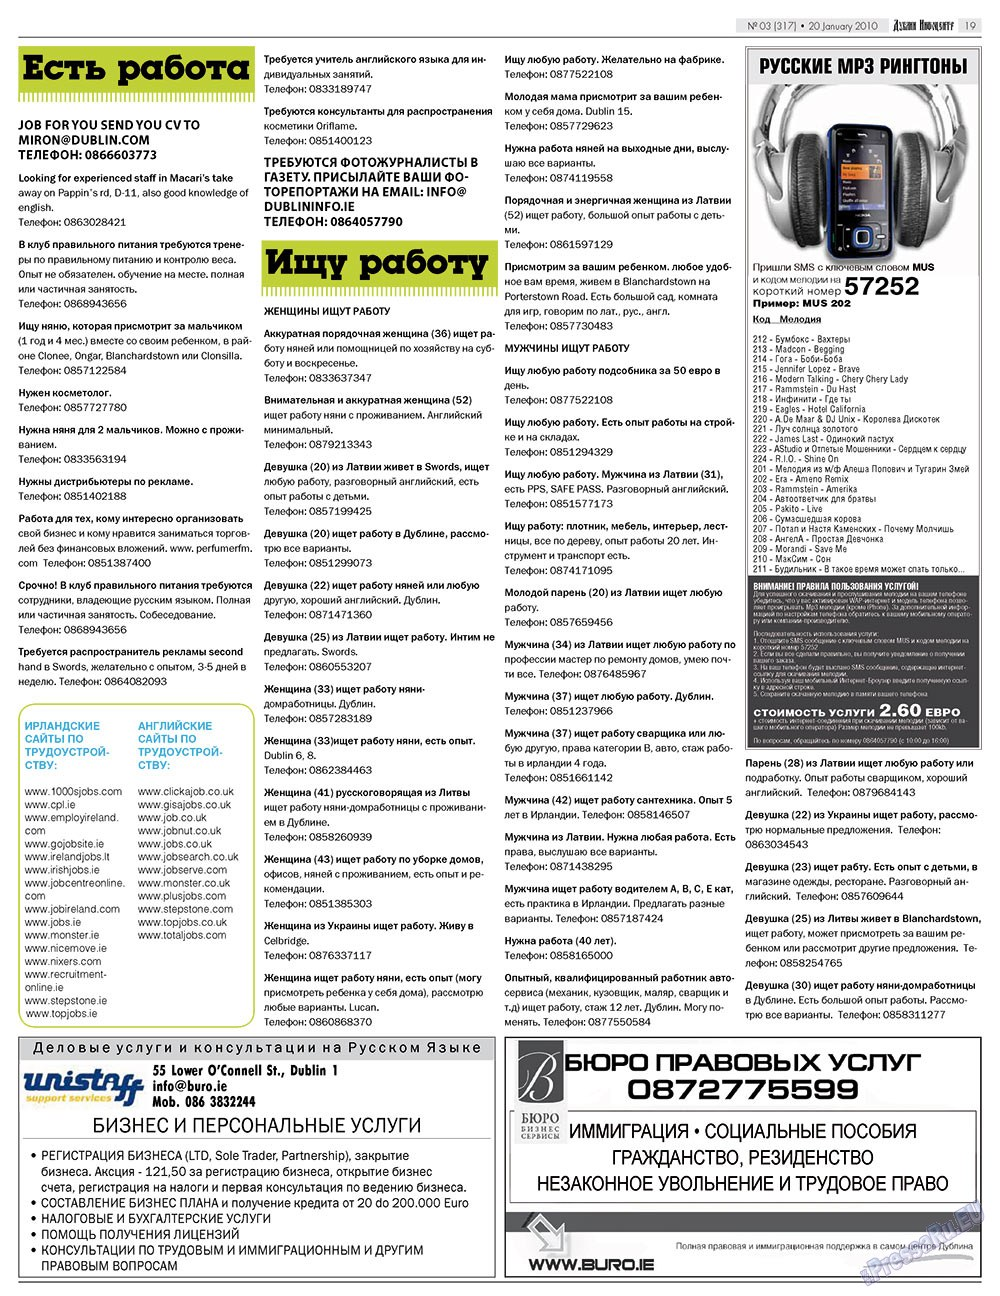 Дублин инфоцентр (газета). 2010 год, номер 3, стр. 19